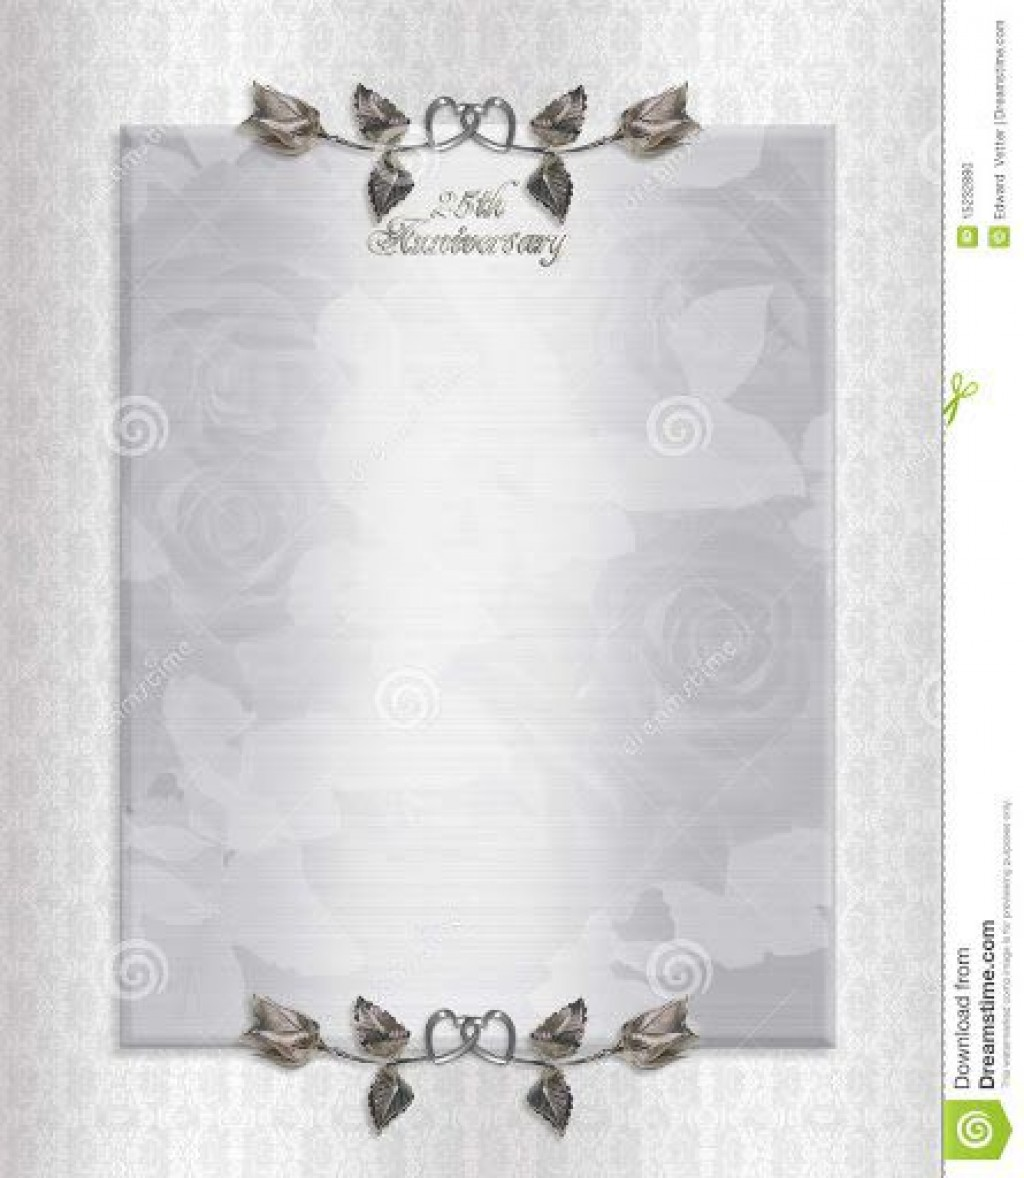 009 Surprising 50th Anniversary Invitation Template Free Concept  Download Golden WeddingLarge